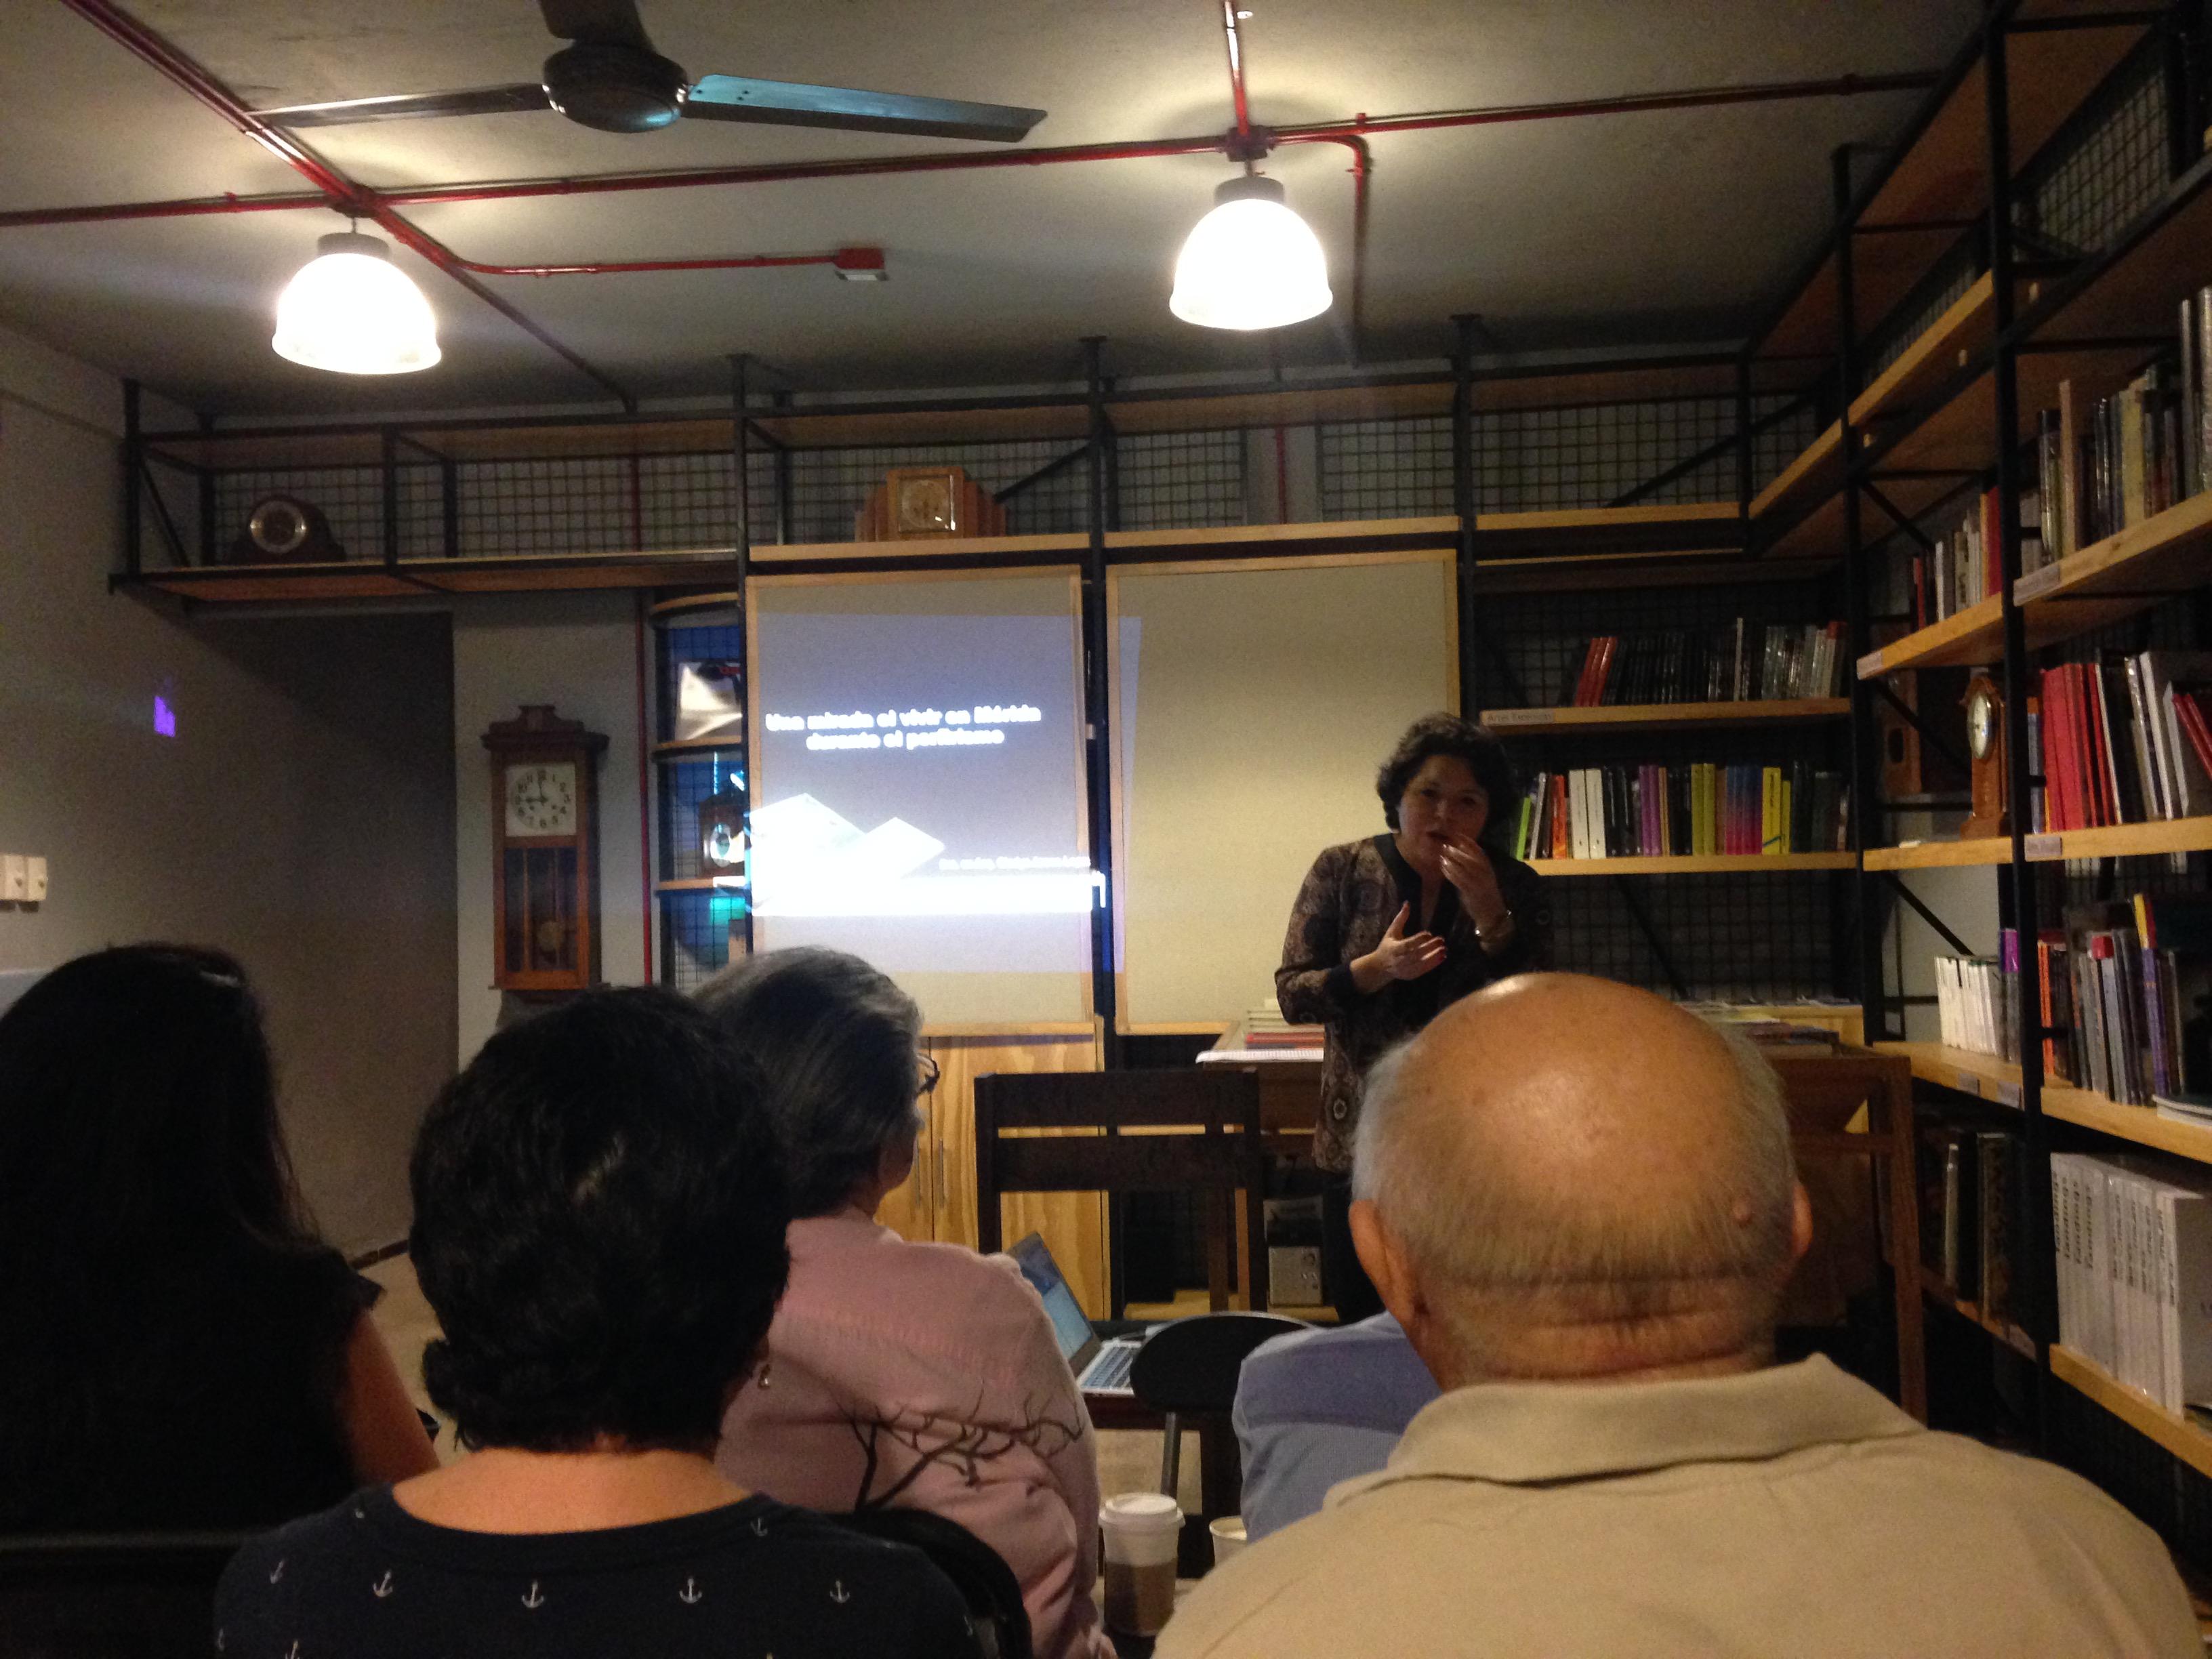 La Dra. Gladys Arana durante la conferencia